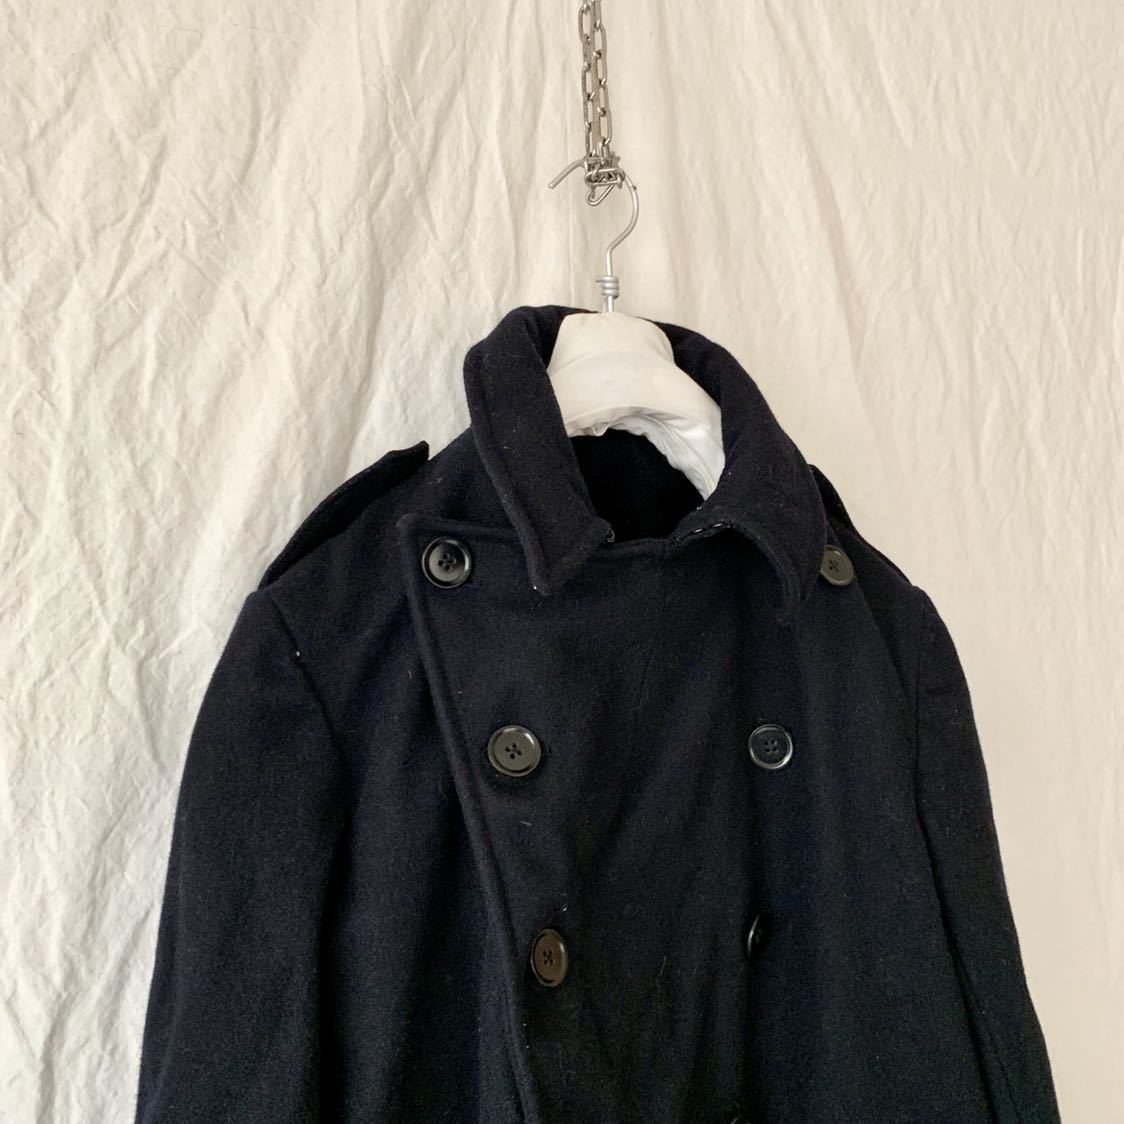 40s 50s イギリス ビンテージ ヘビーメルトン ファイヤーマン コート ウール ワーク 濃紺 ピーコート ダッフル _画像6